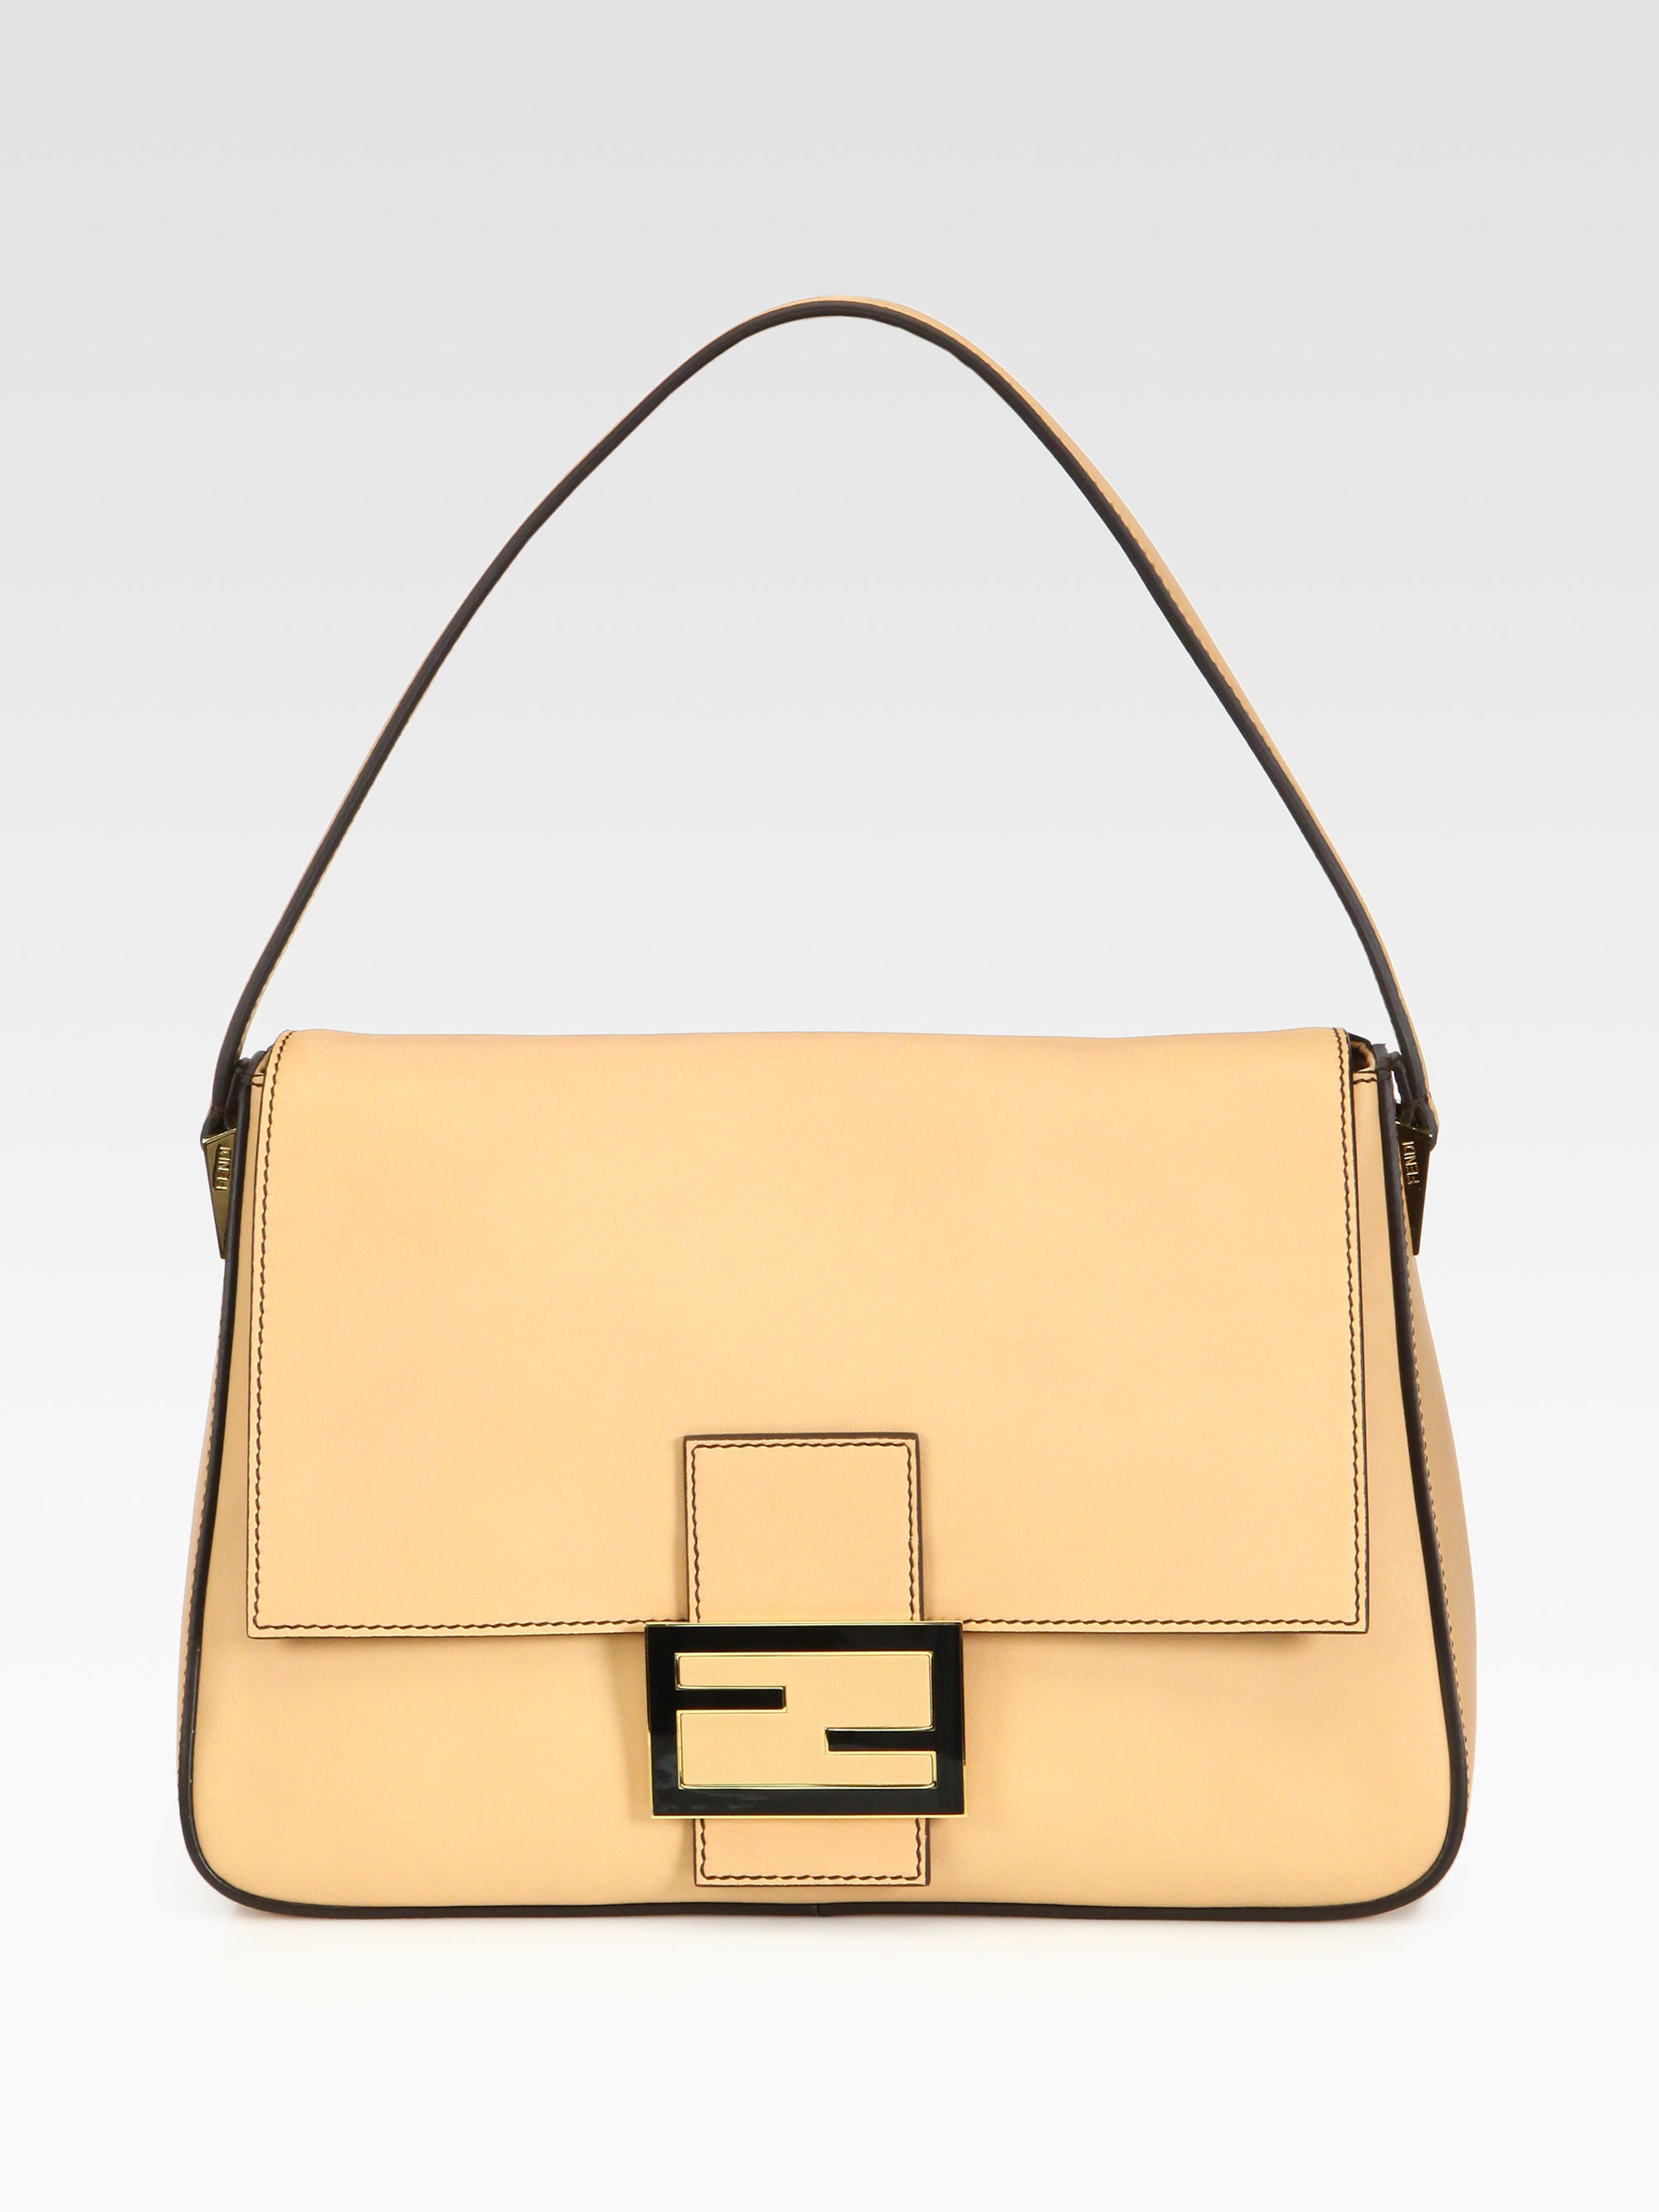 dcf367fdd11f Lyst - Fendi Forever Mama Bag in Natural